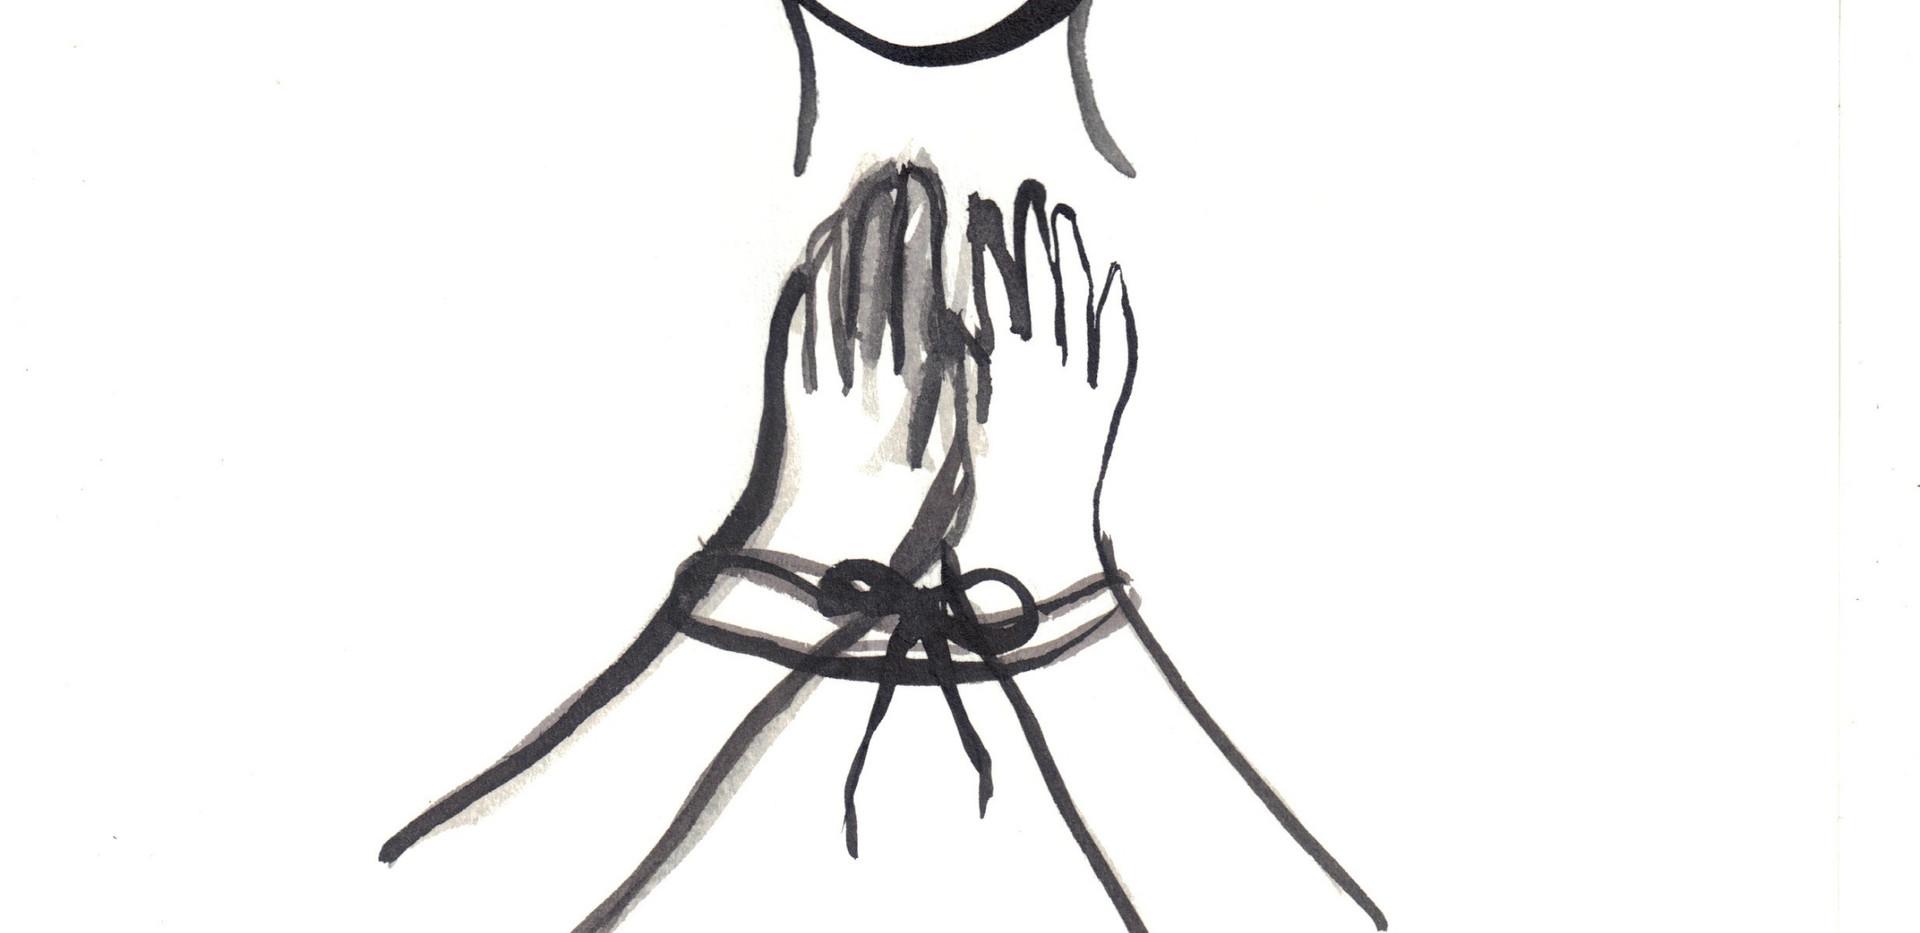 Junkanoohakkamama: Send Me as You Spirit Healer (Smell)